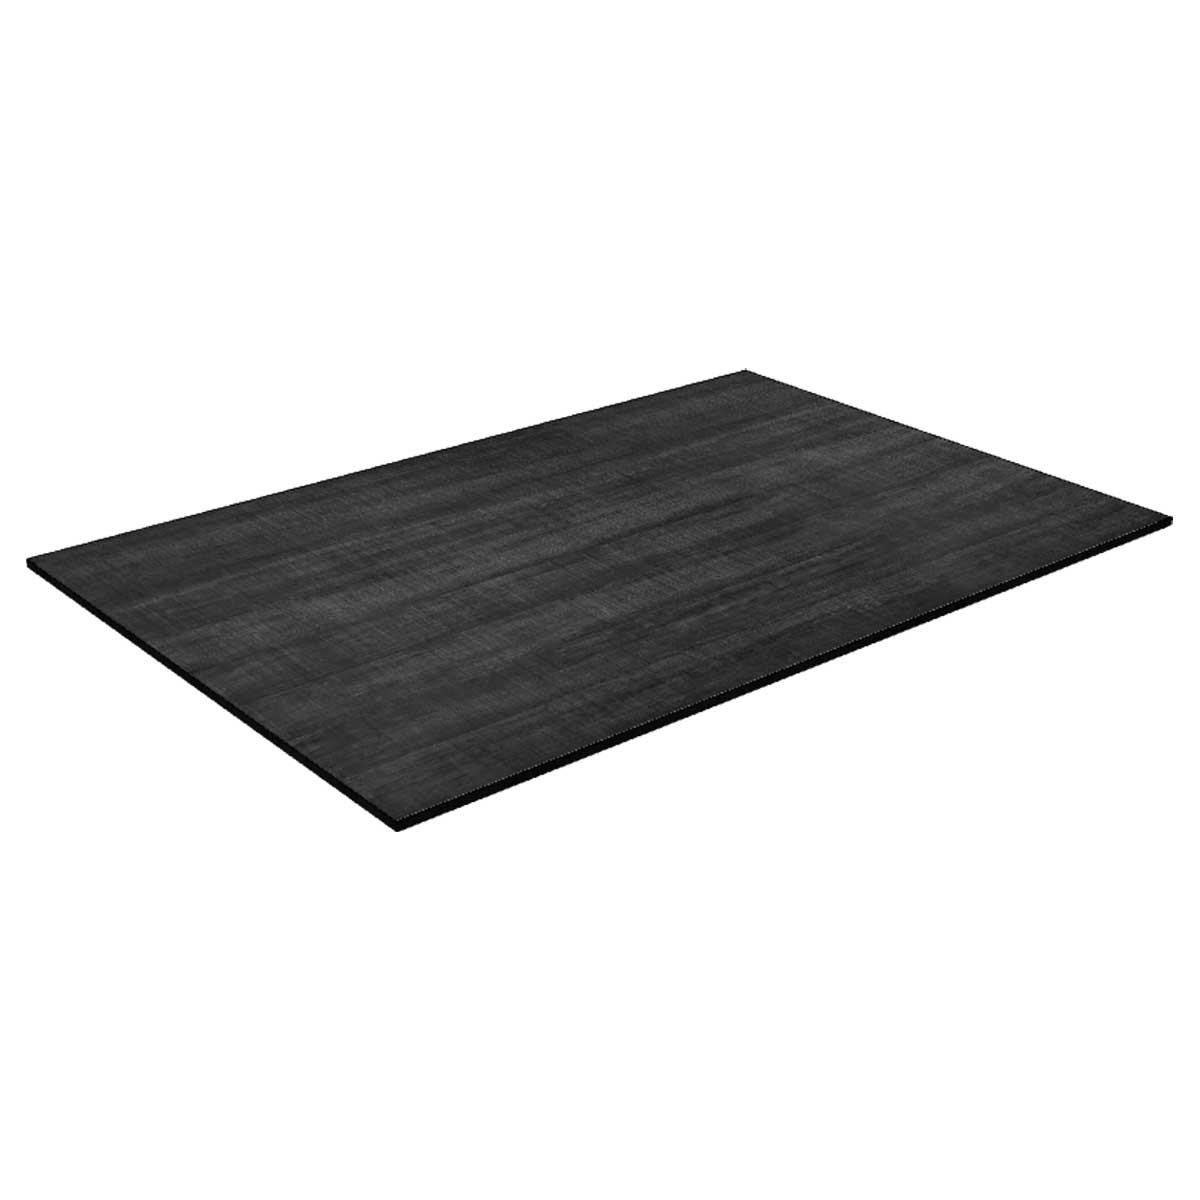 TICAR E120X80 065 - https://www.werzalit.com/nl/product/tafelblad-carino-e-100x60-dikte-tafelblad-12mm-decor-065-palisade-aschgrau/